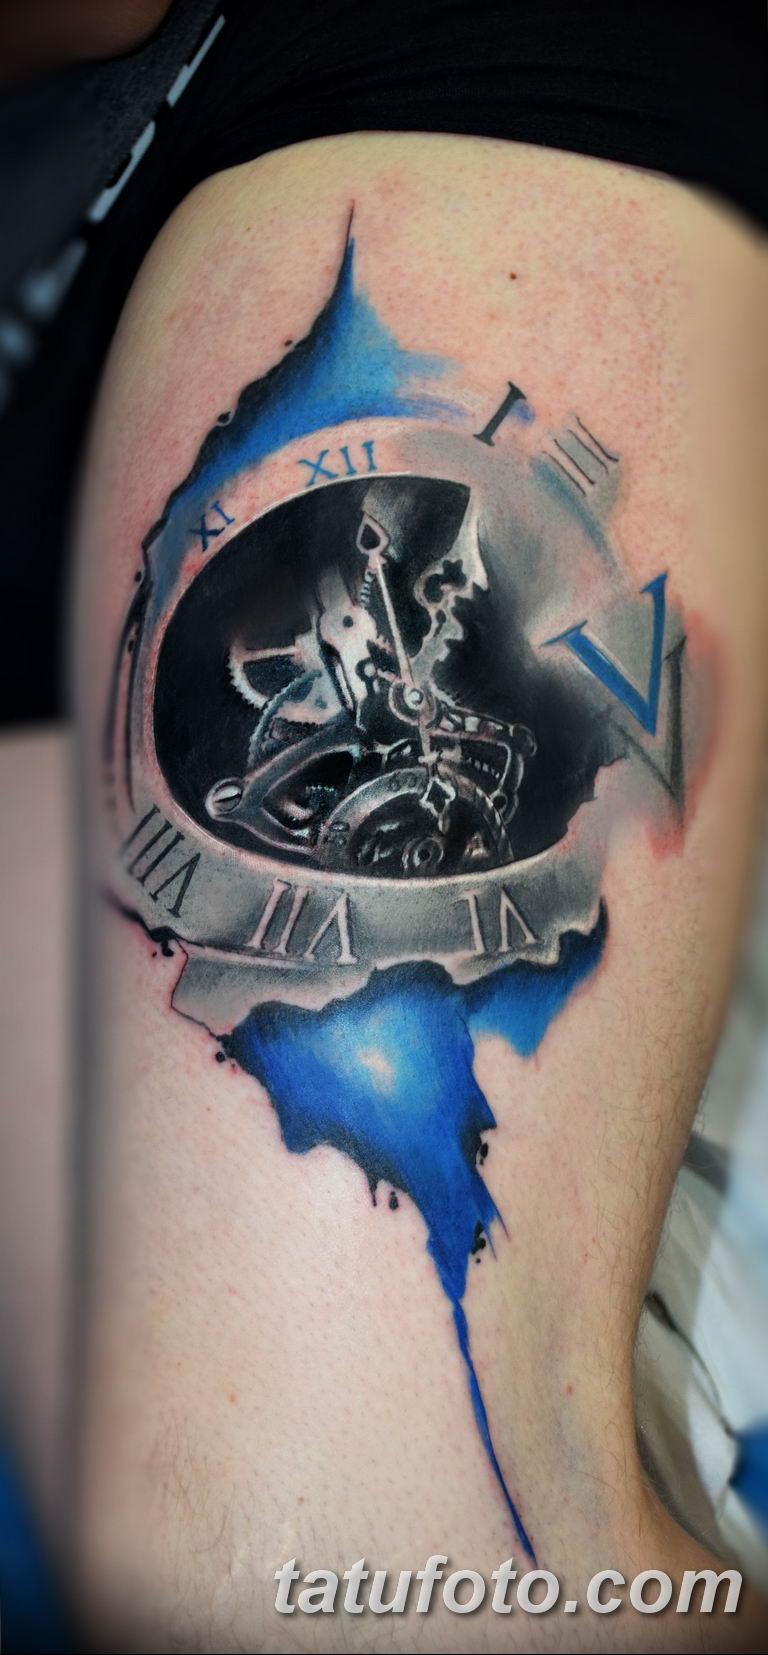 Фото ттату время (часы) 16.04.2019 №535 - tattoo time (hours) - tatufoto.com